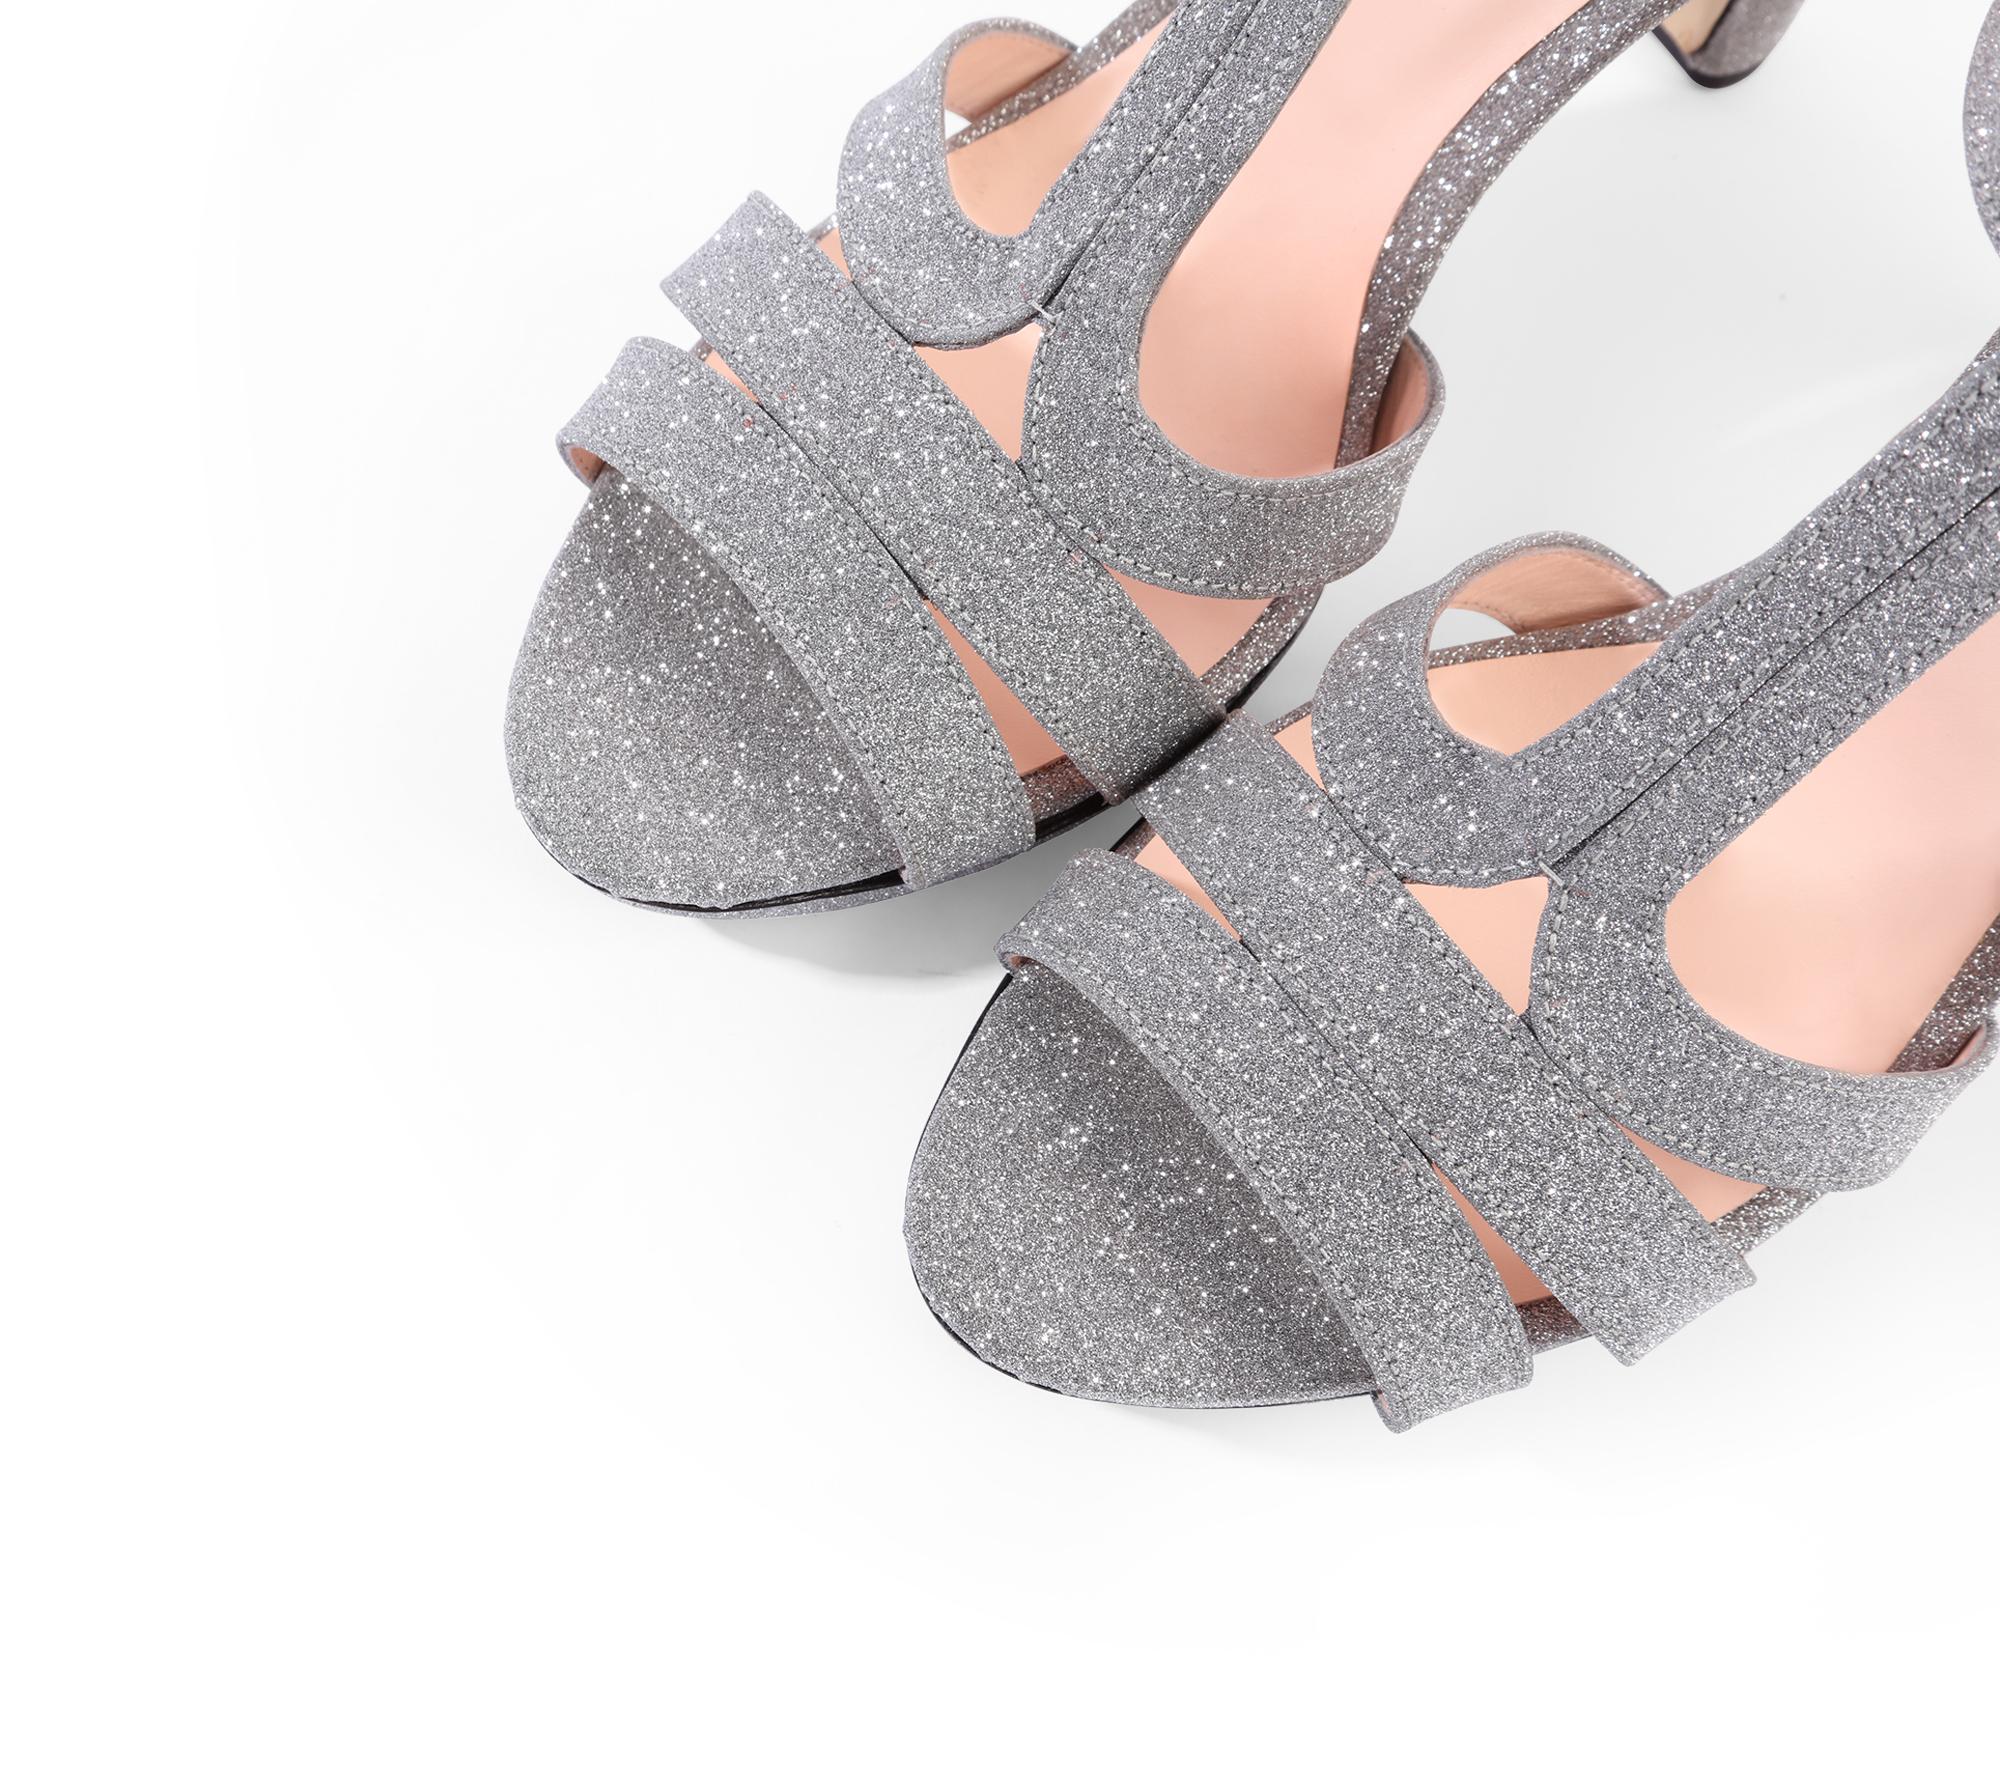 Bikini sandals